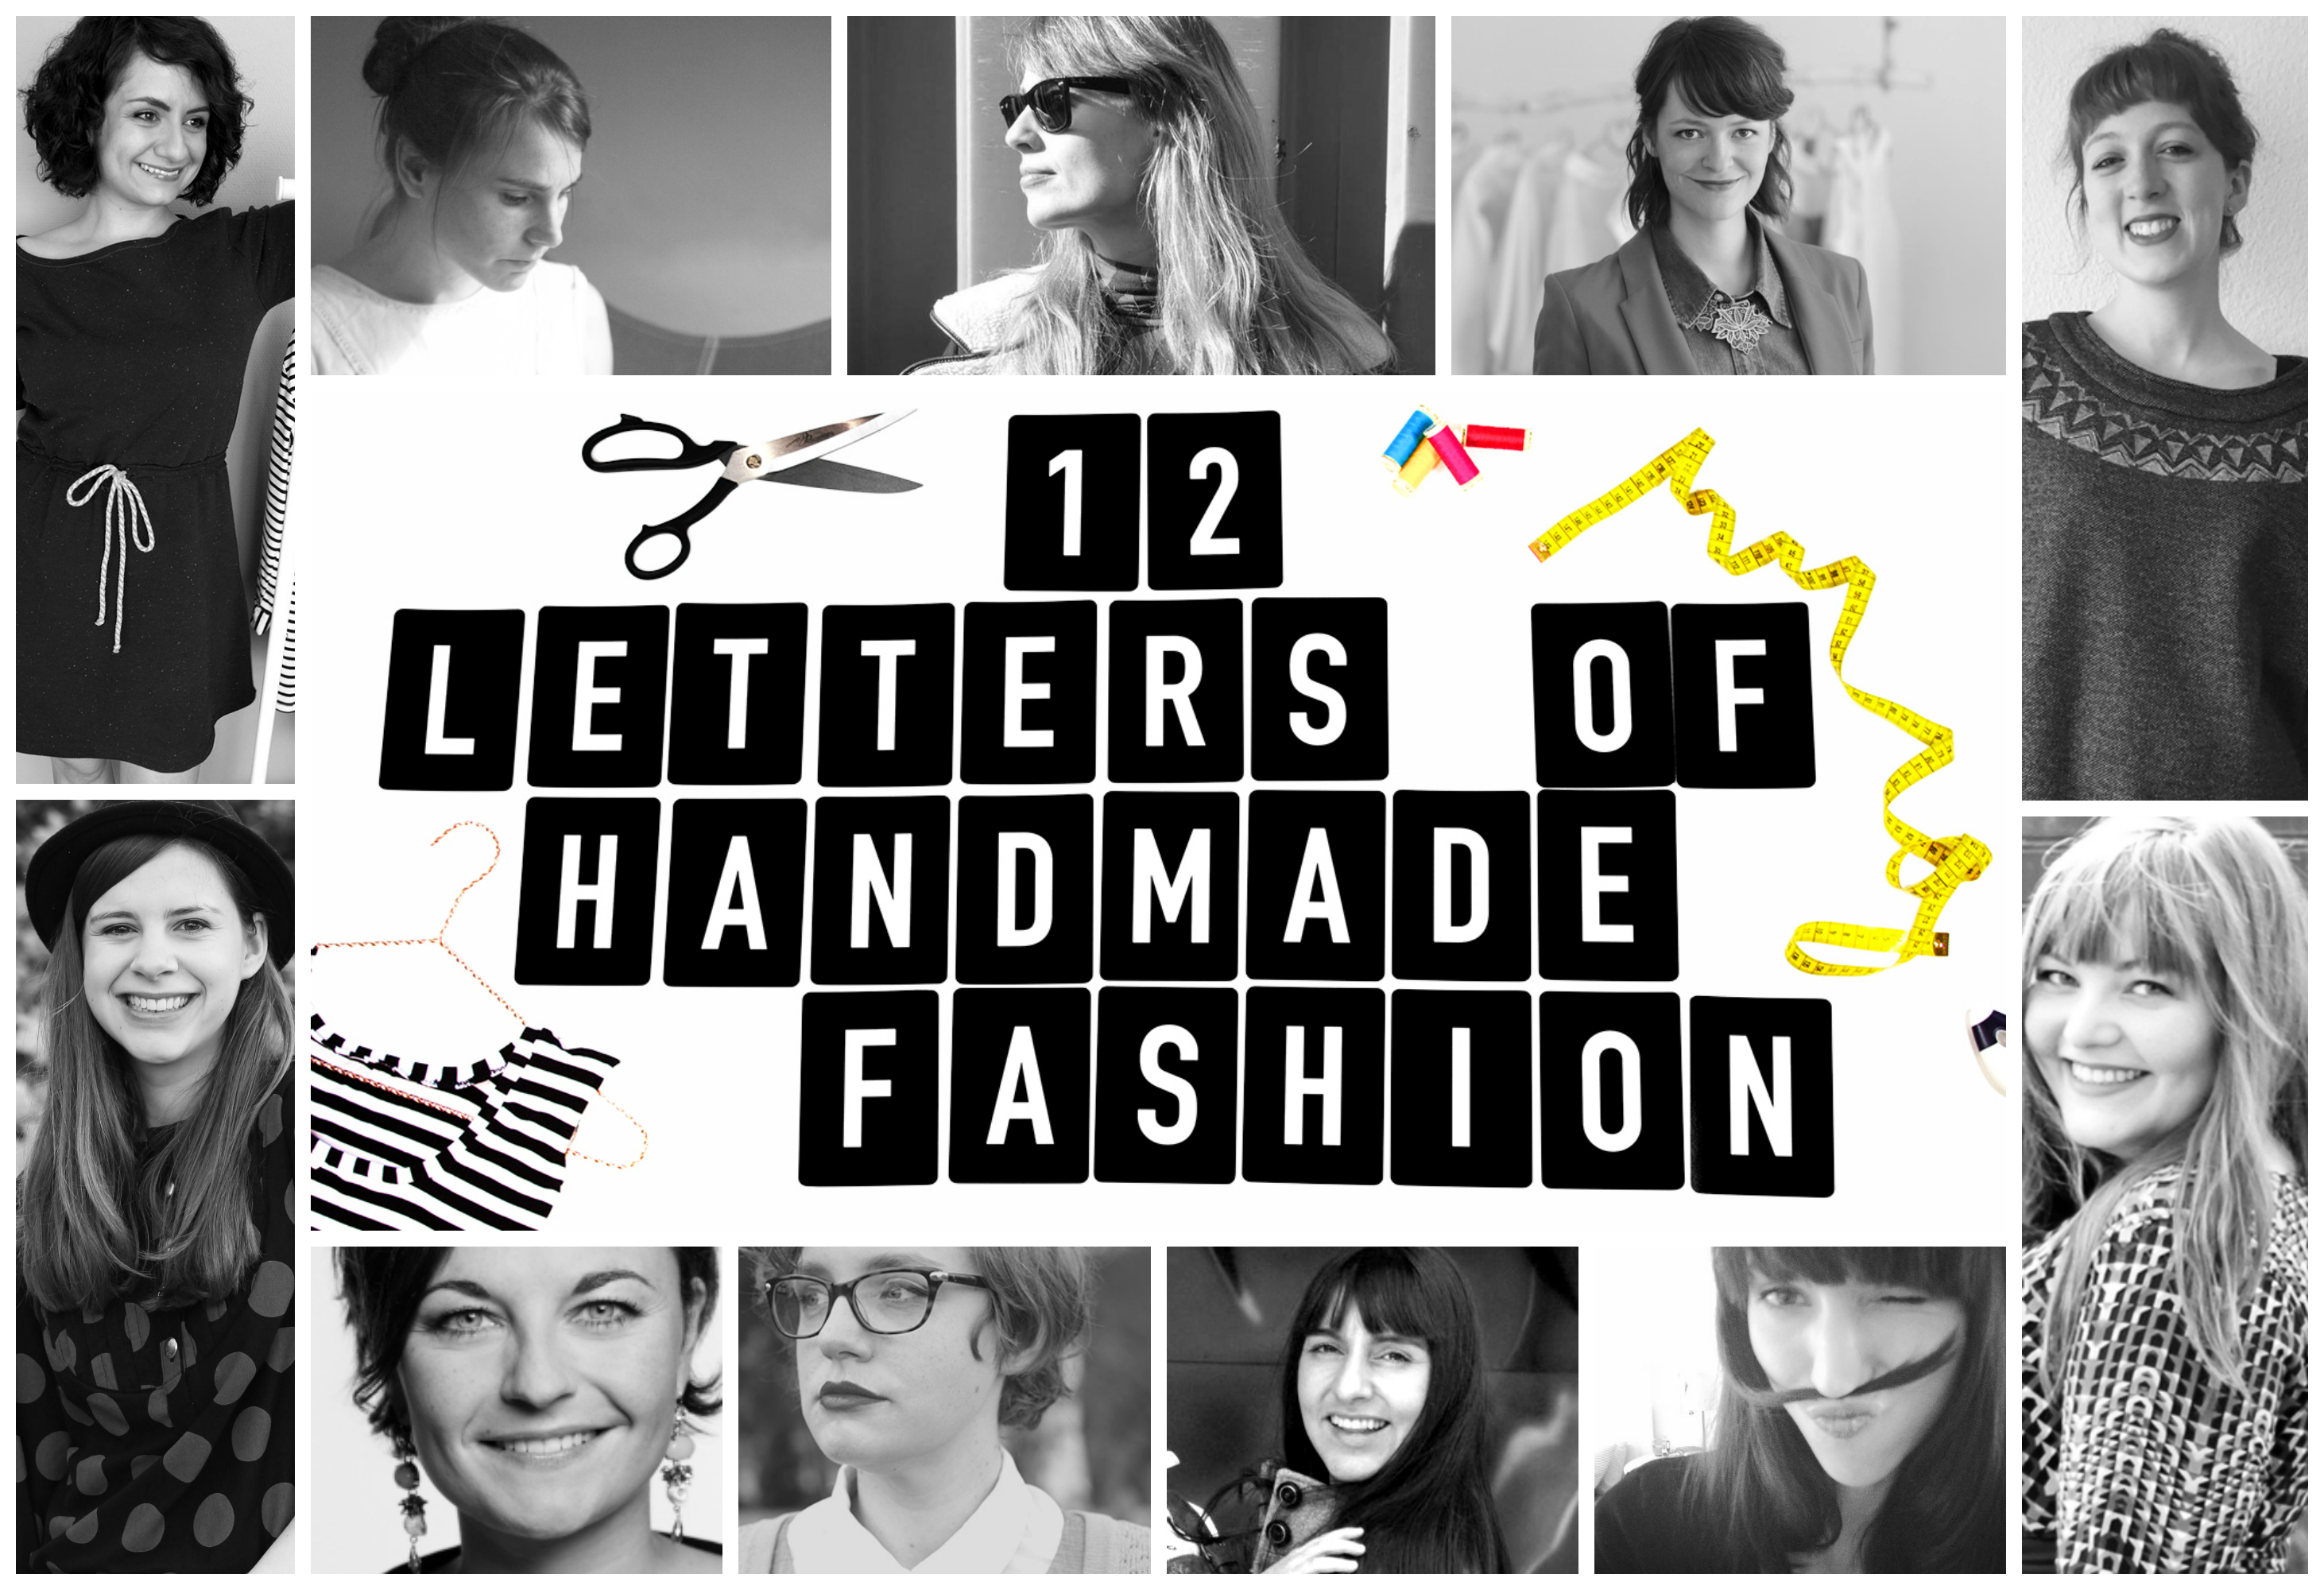 12 Letters of Handmade Fashion Gastgeber